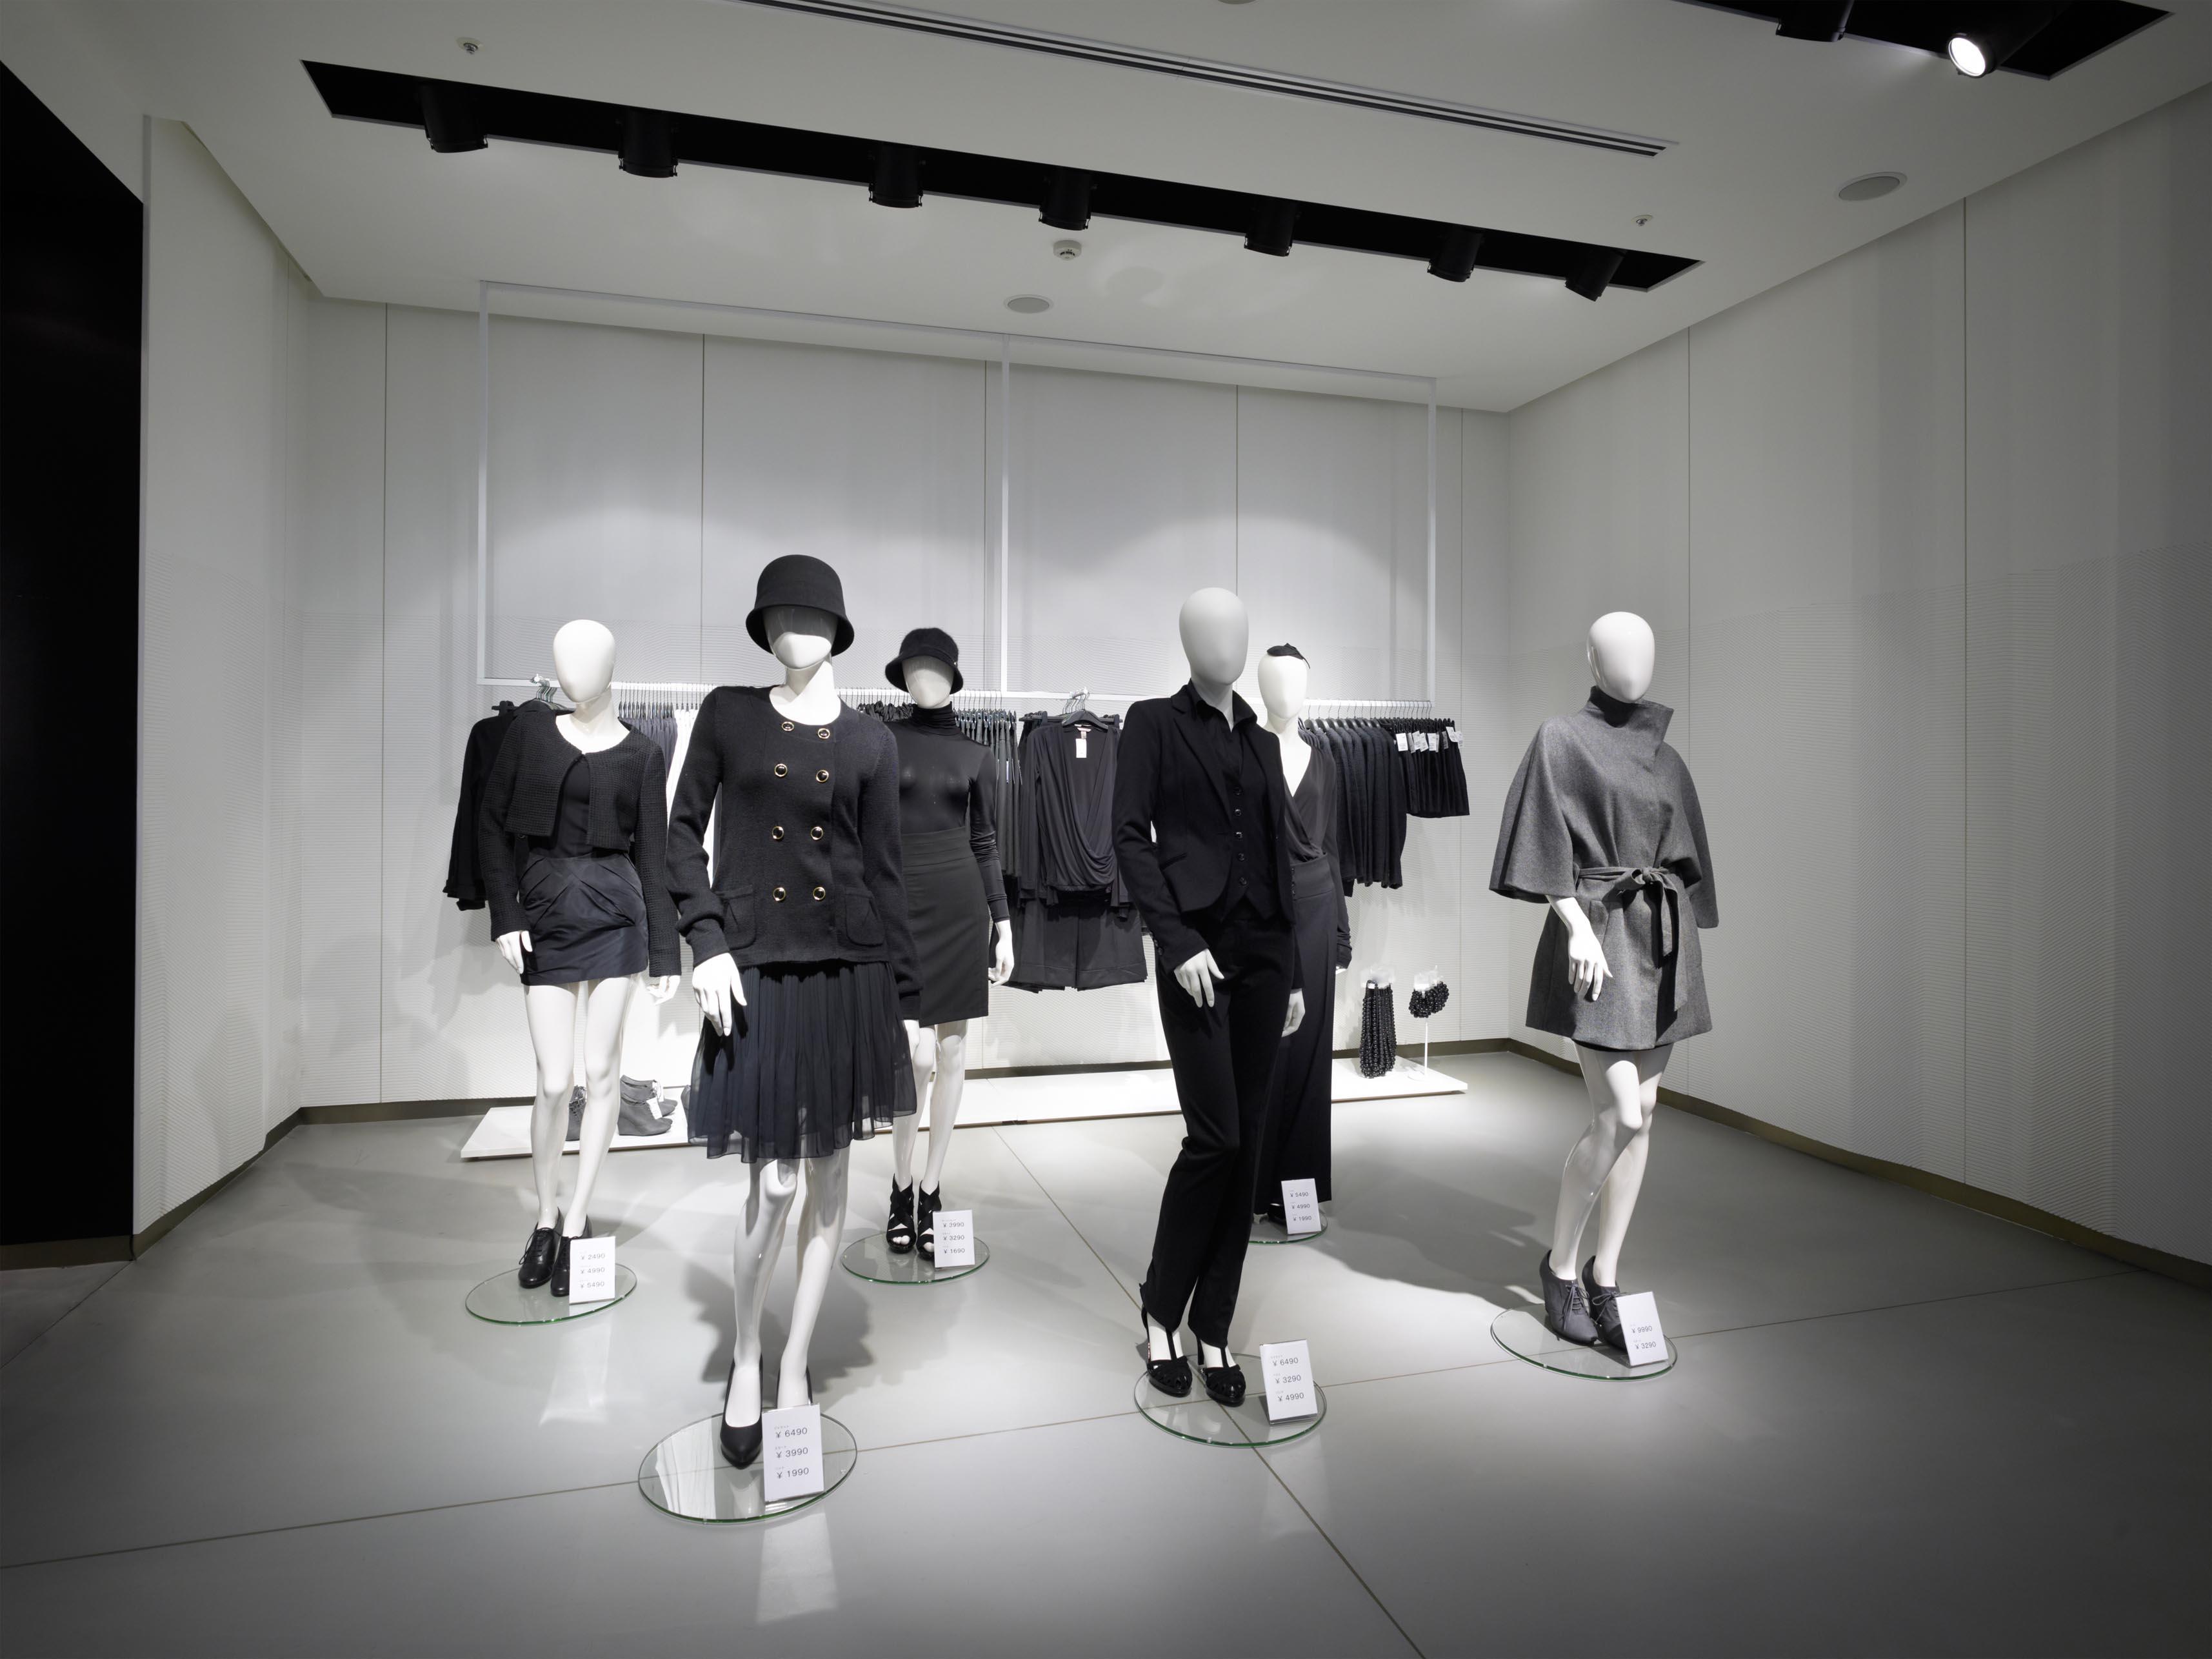 ¿H&M en Latinoamérica?